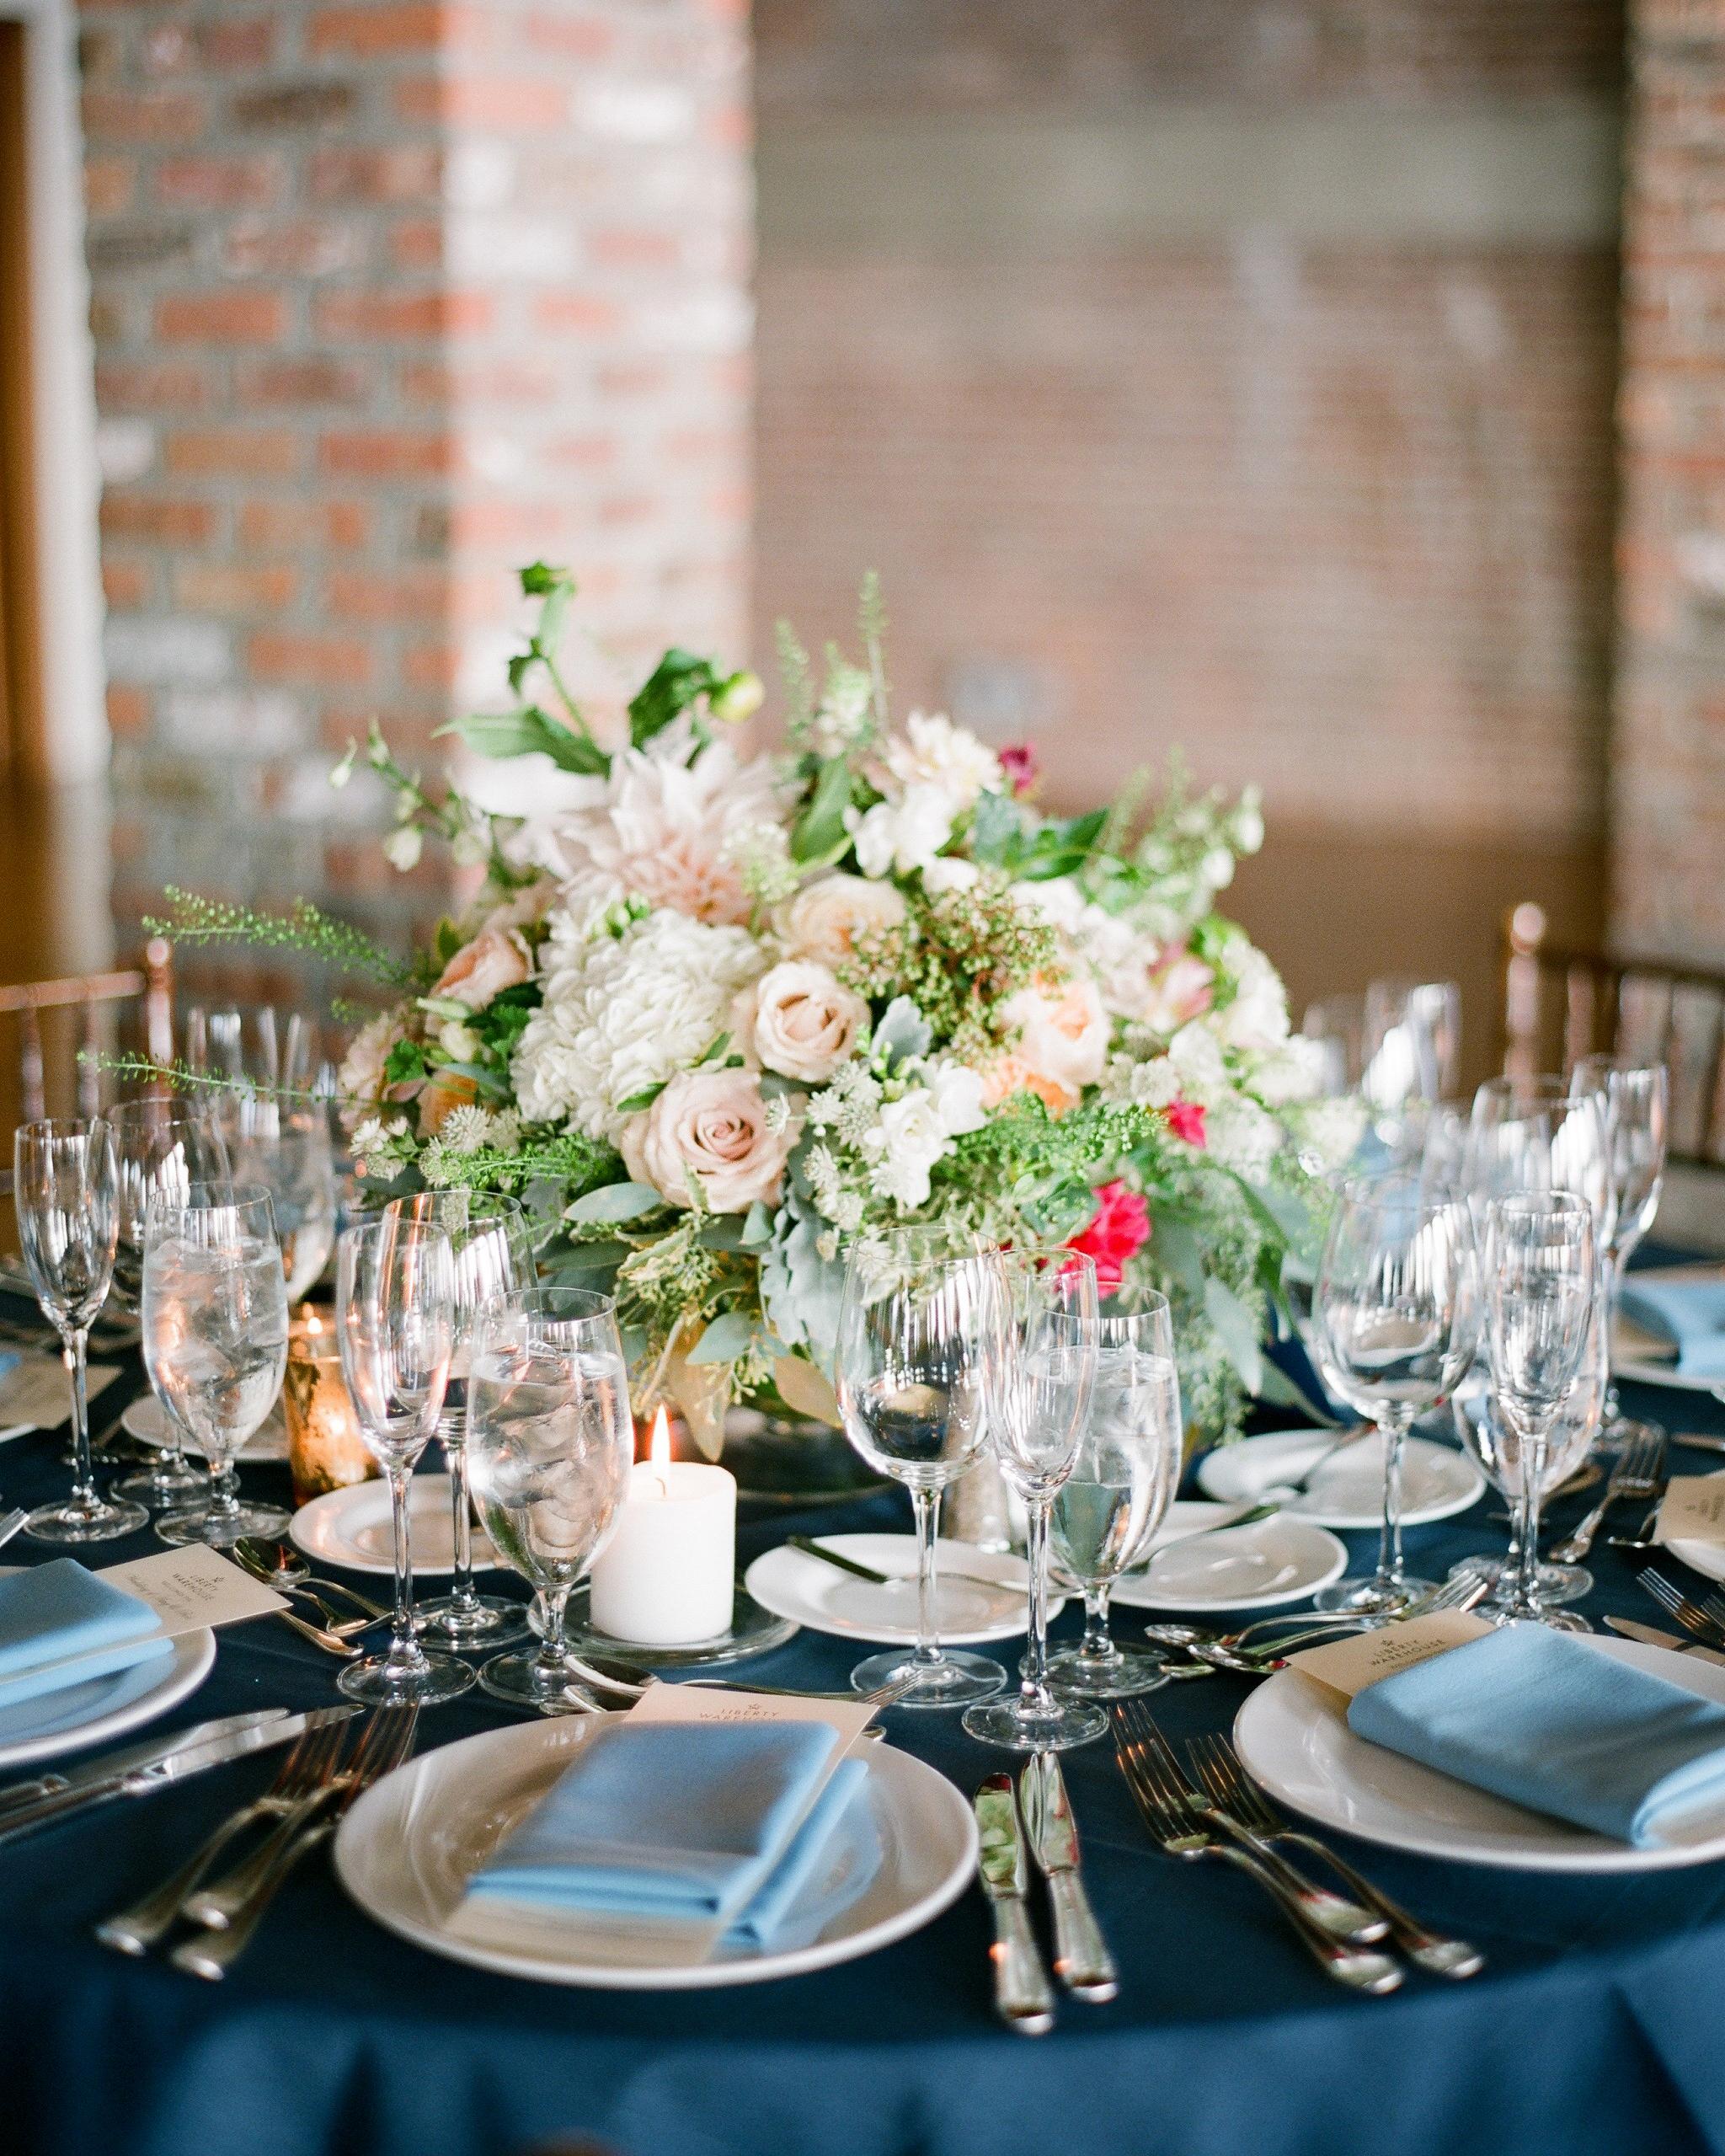 amy-bob-wedding-table-0753-s111884-0715.jpg